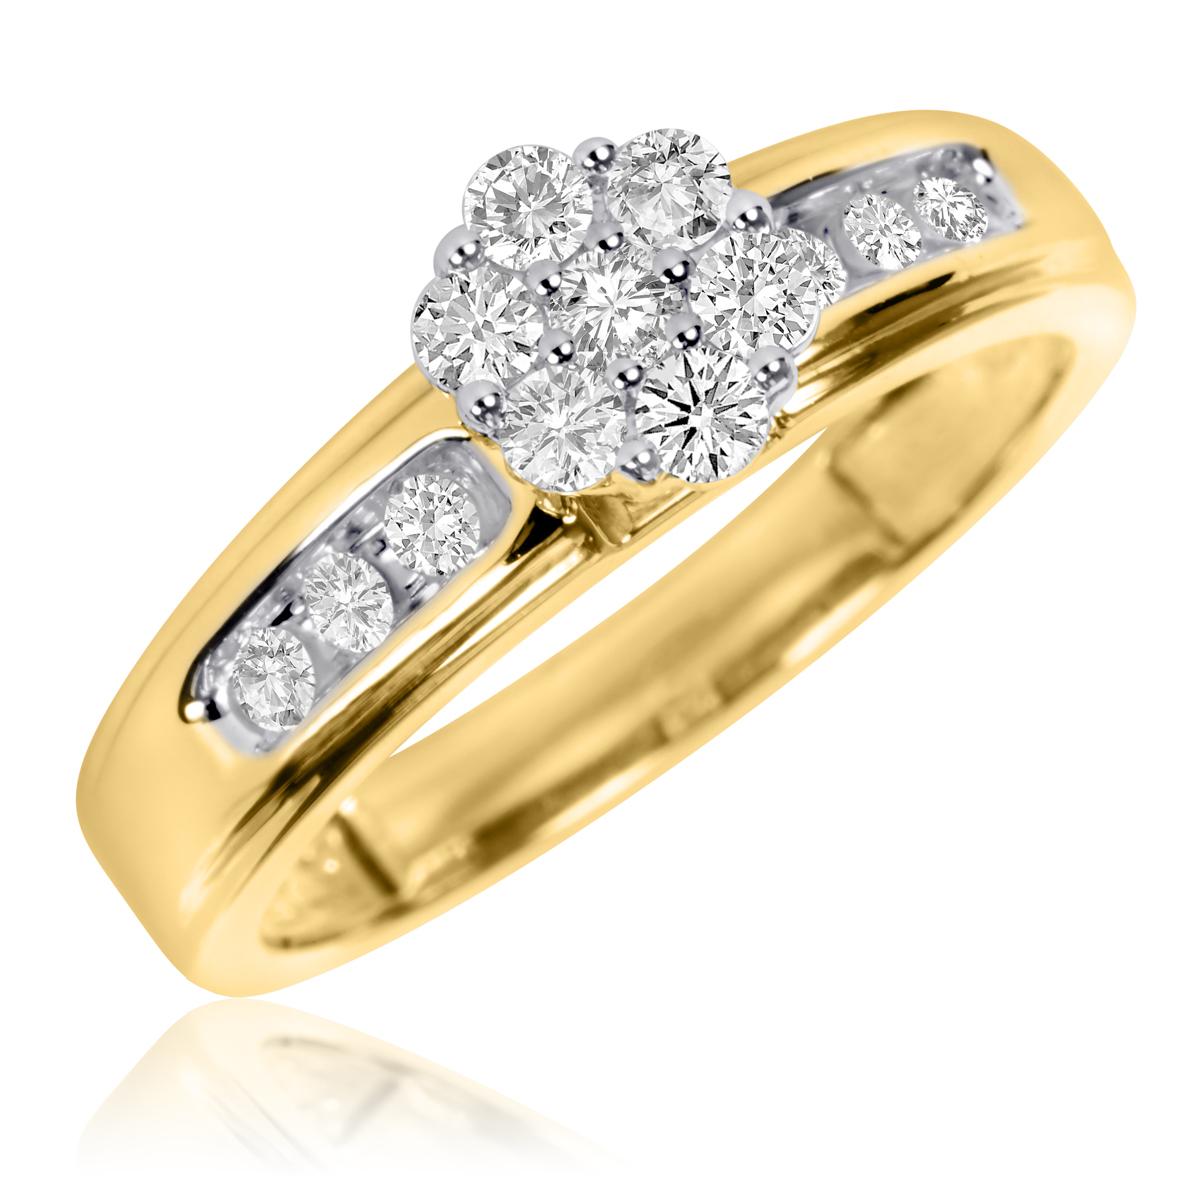 3/8 Carat T.W. Round Cut Diamond Ladies Engagement Ring 10K Yellow Gold- Size 8